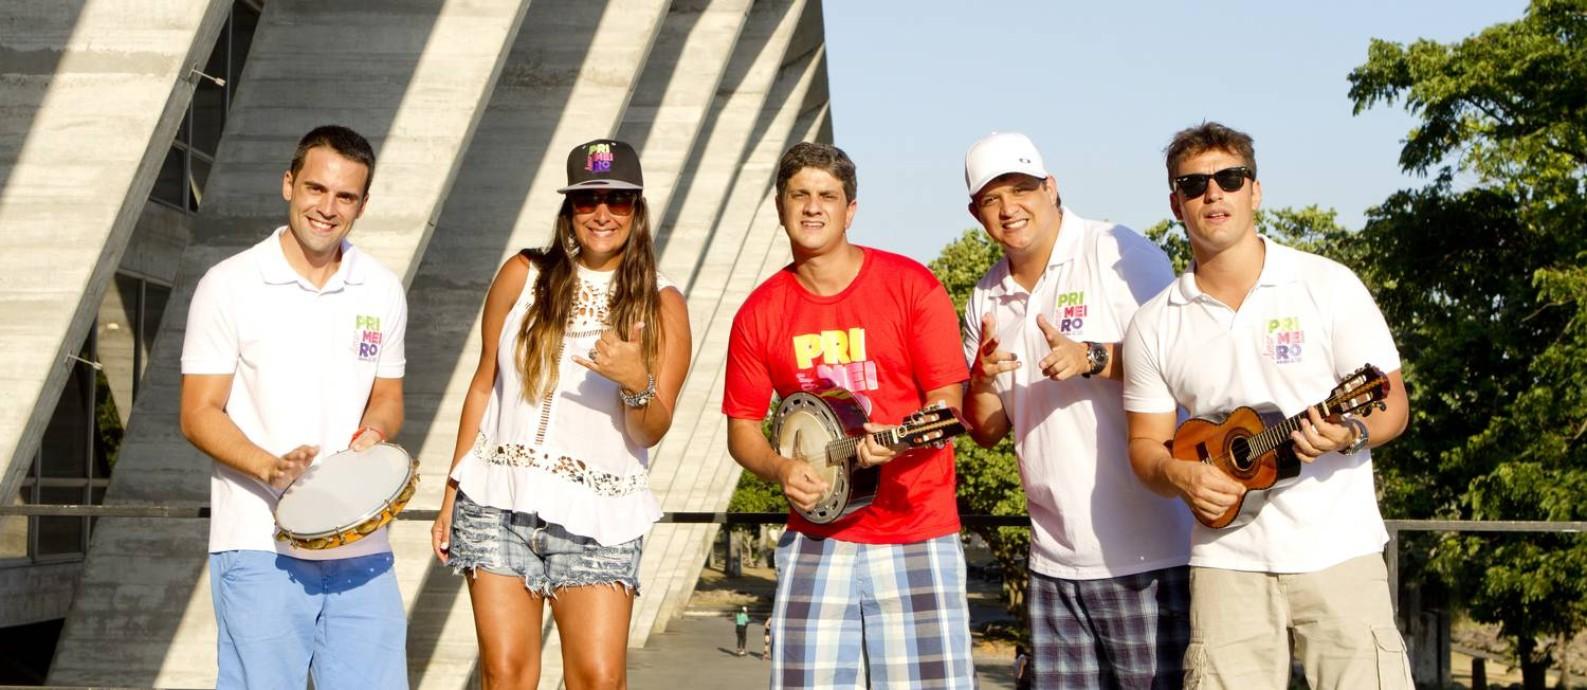 BA - Rio de Janeiro - 17/01/2015 - CARNAVAL - Os integrante do bloco Primeiro Amor Samba Retrô. Foto Bia Guedes / Agência O Globo. Foto: Bia Guedes : Bianca Guedes